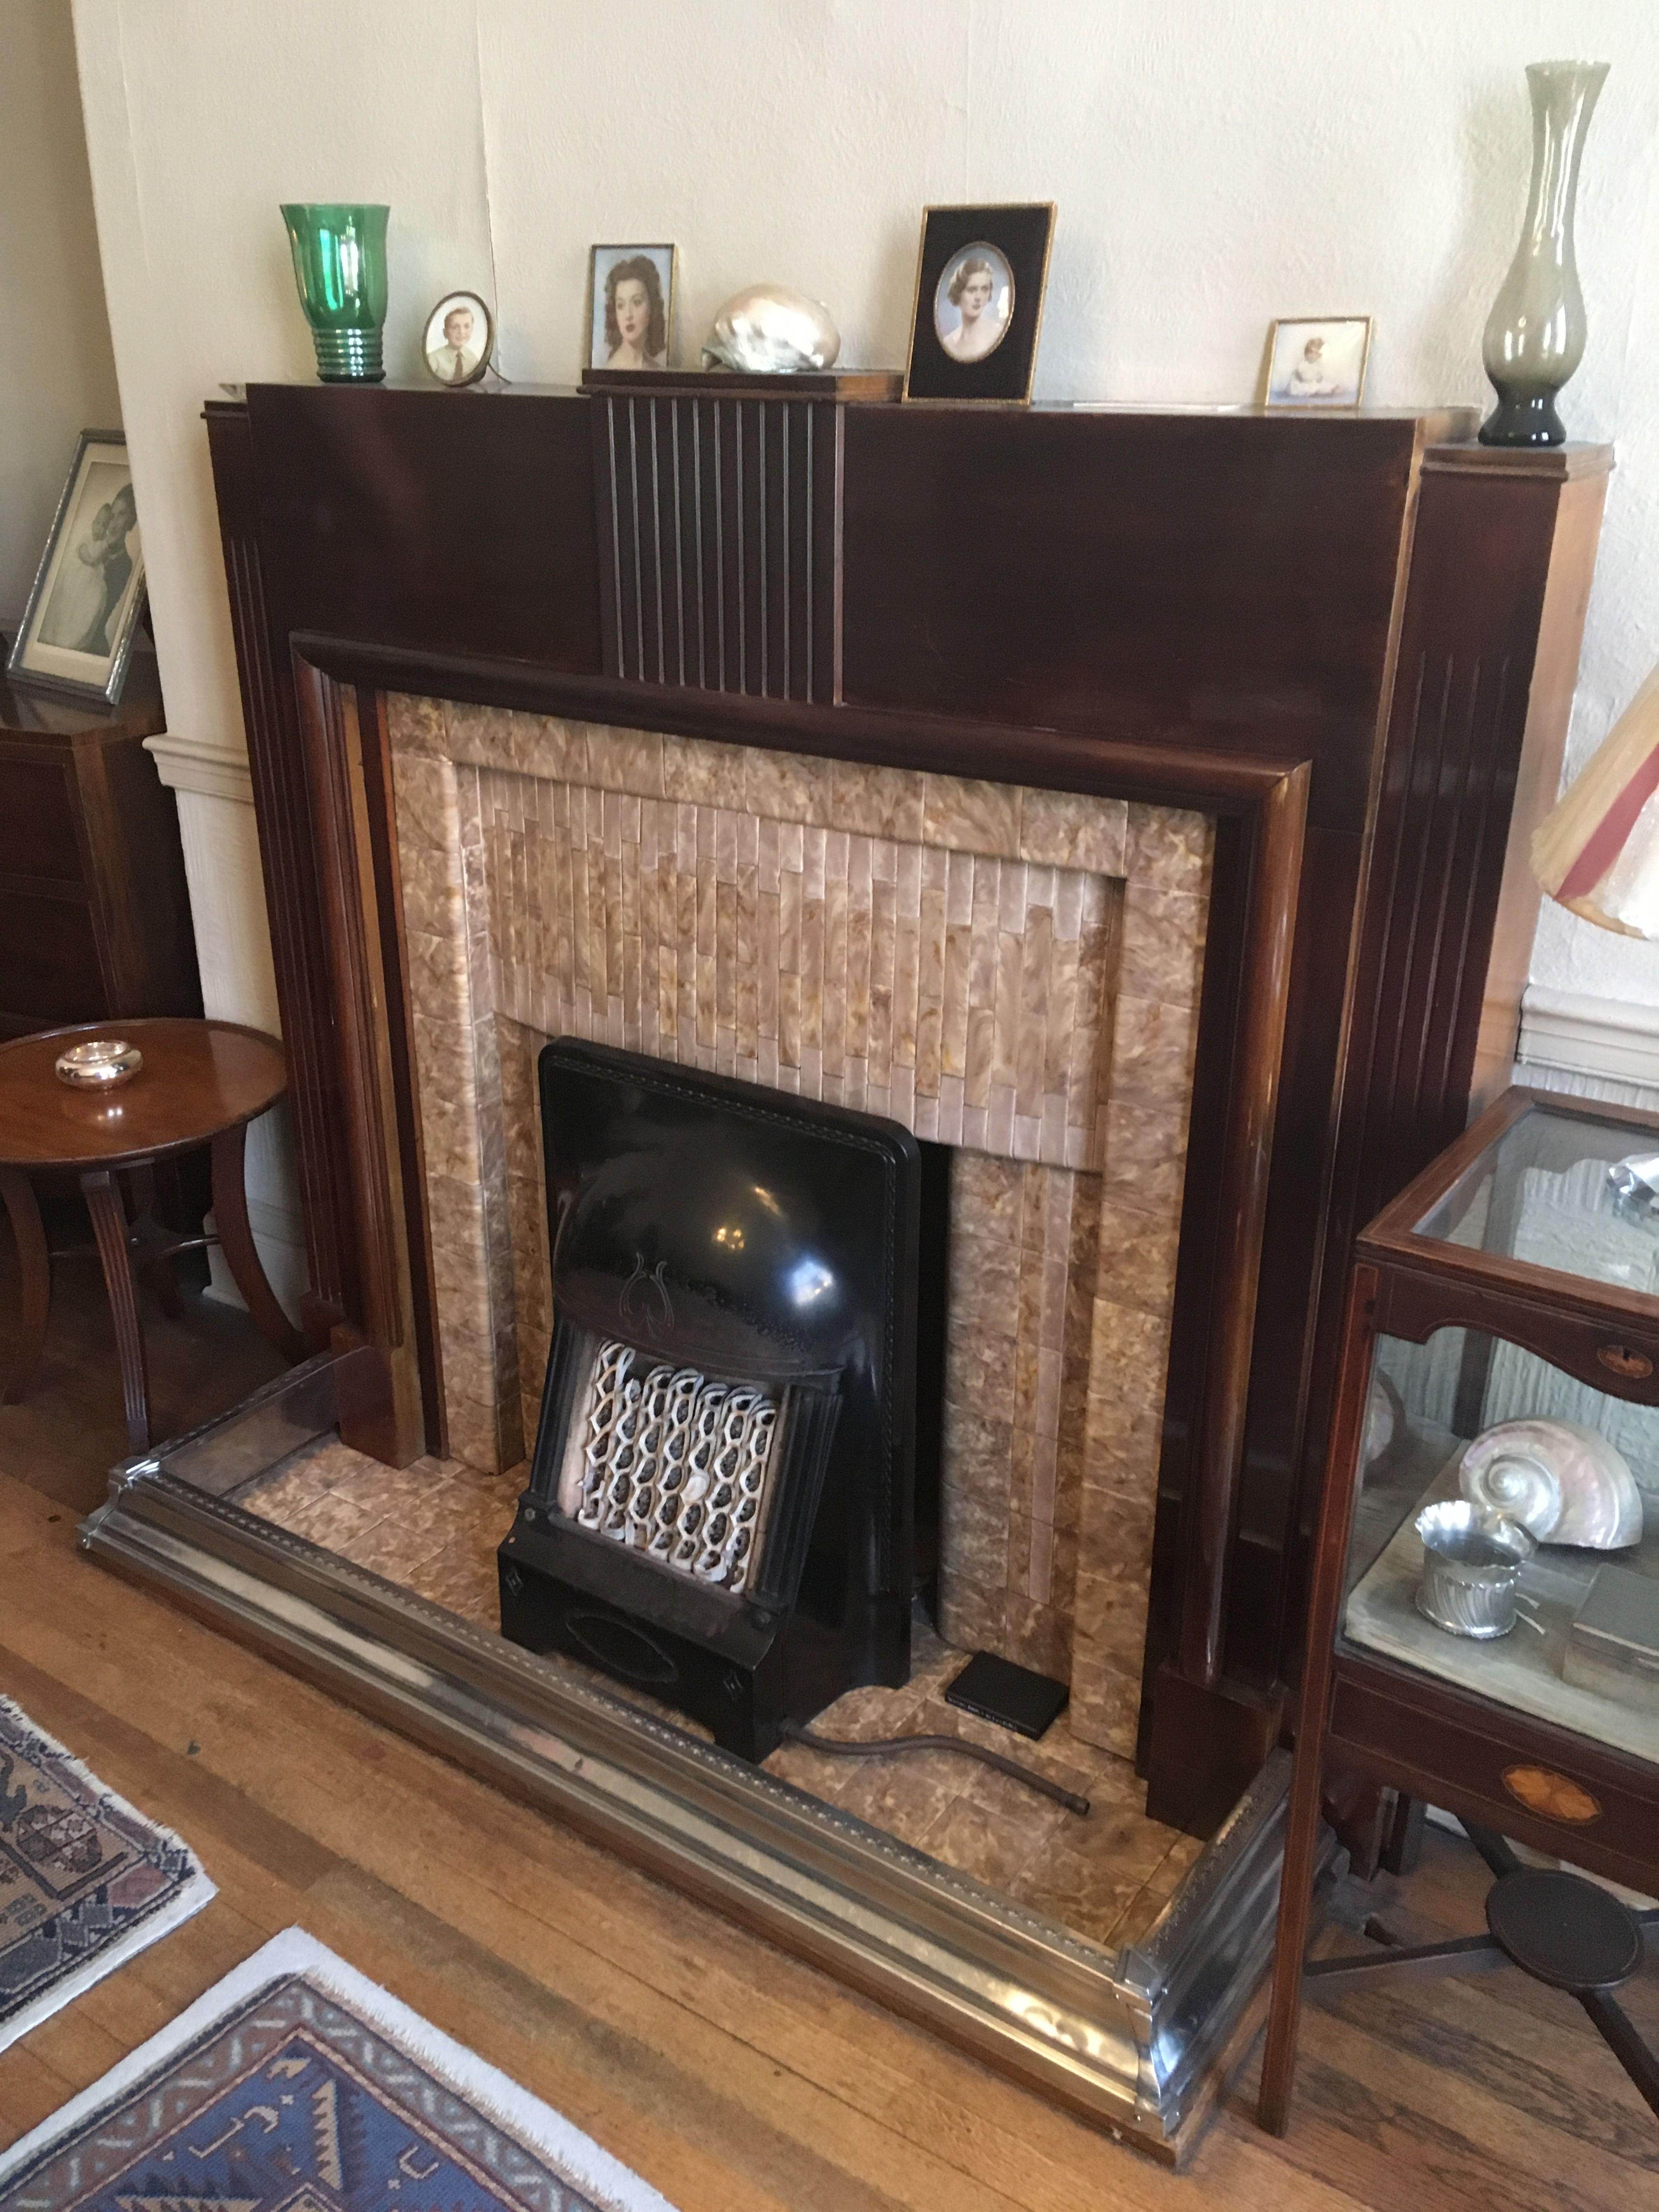 1930s Art Deco Tiled Fireplace 1930s Fireplace Art Deco Fireplace Fireplace